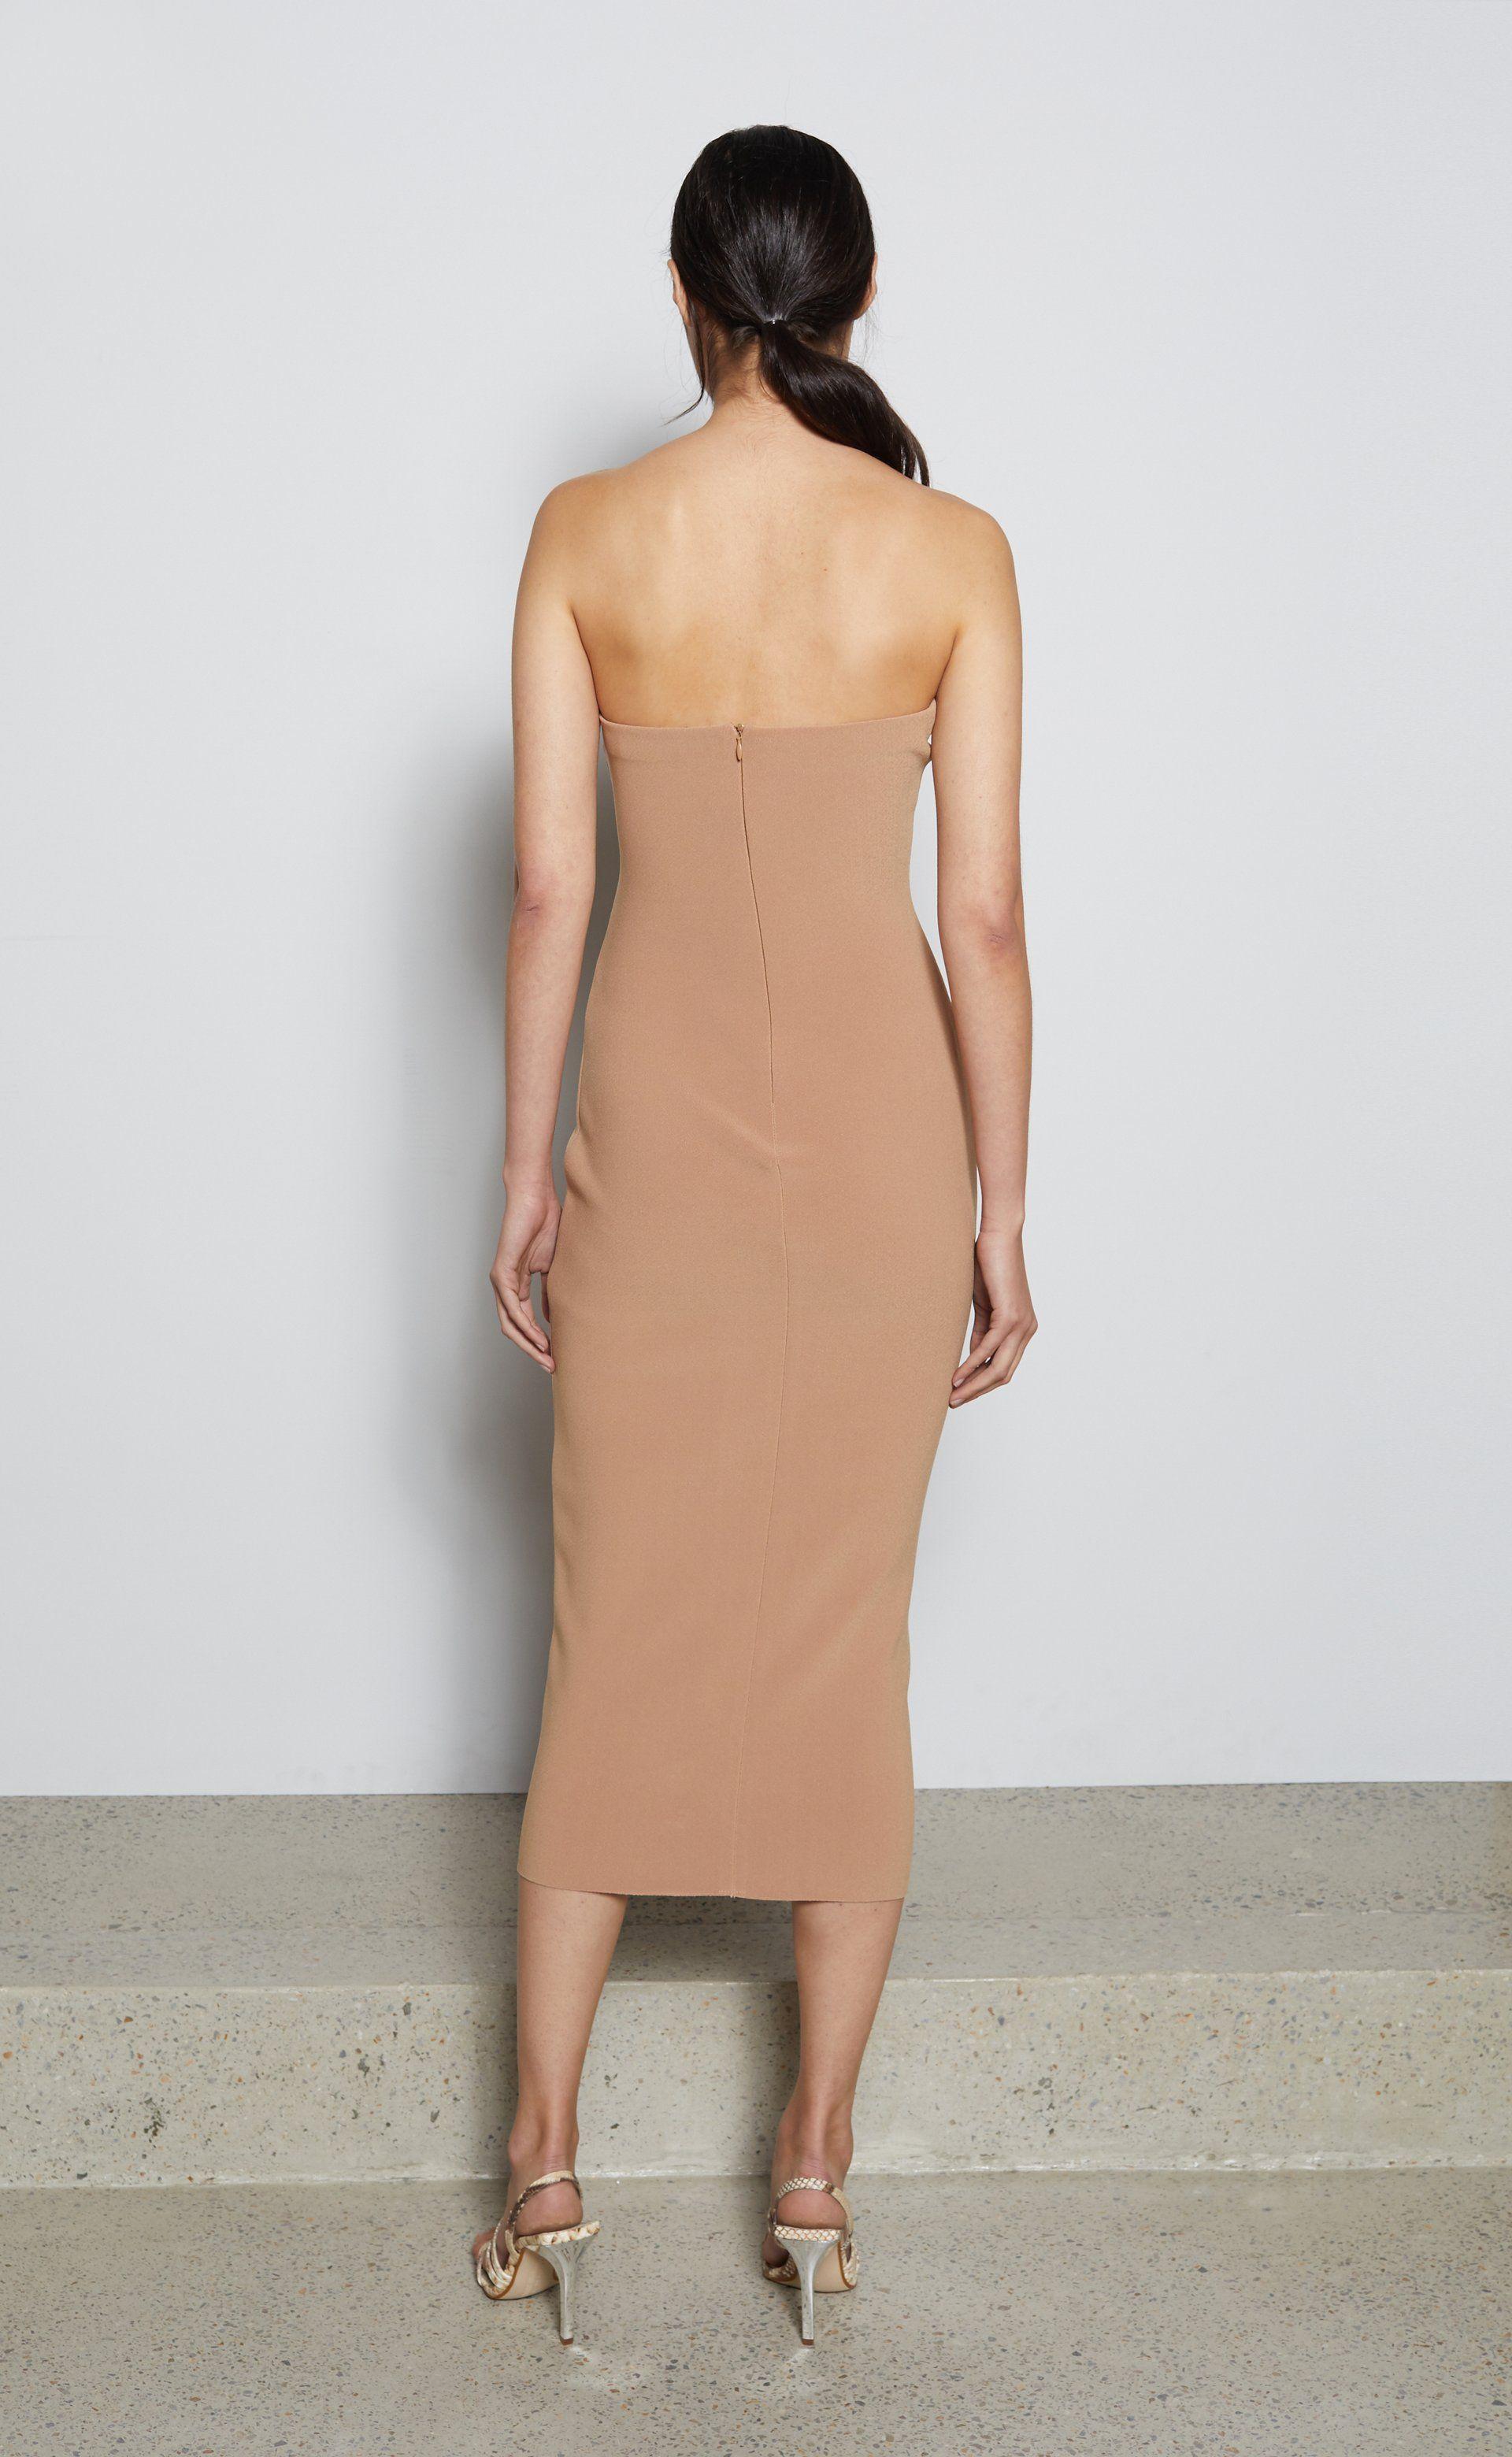 Elke Strapless Midi Dress Caramel Bec Bridge Midi Dress Dresses Strapless Midi Dress [ 3120 x 1920 Pixel ]